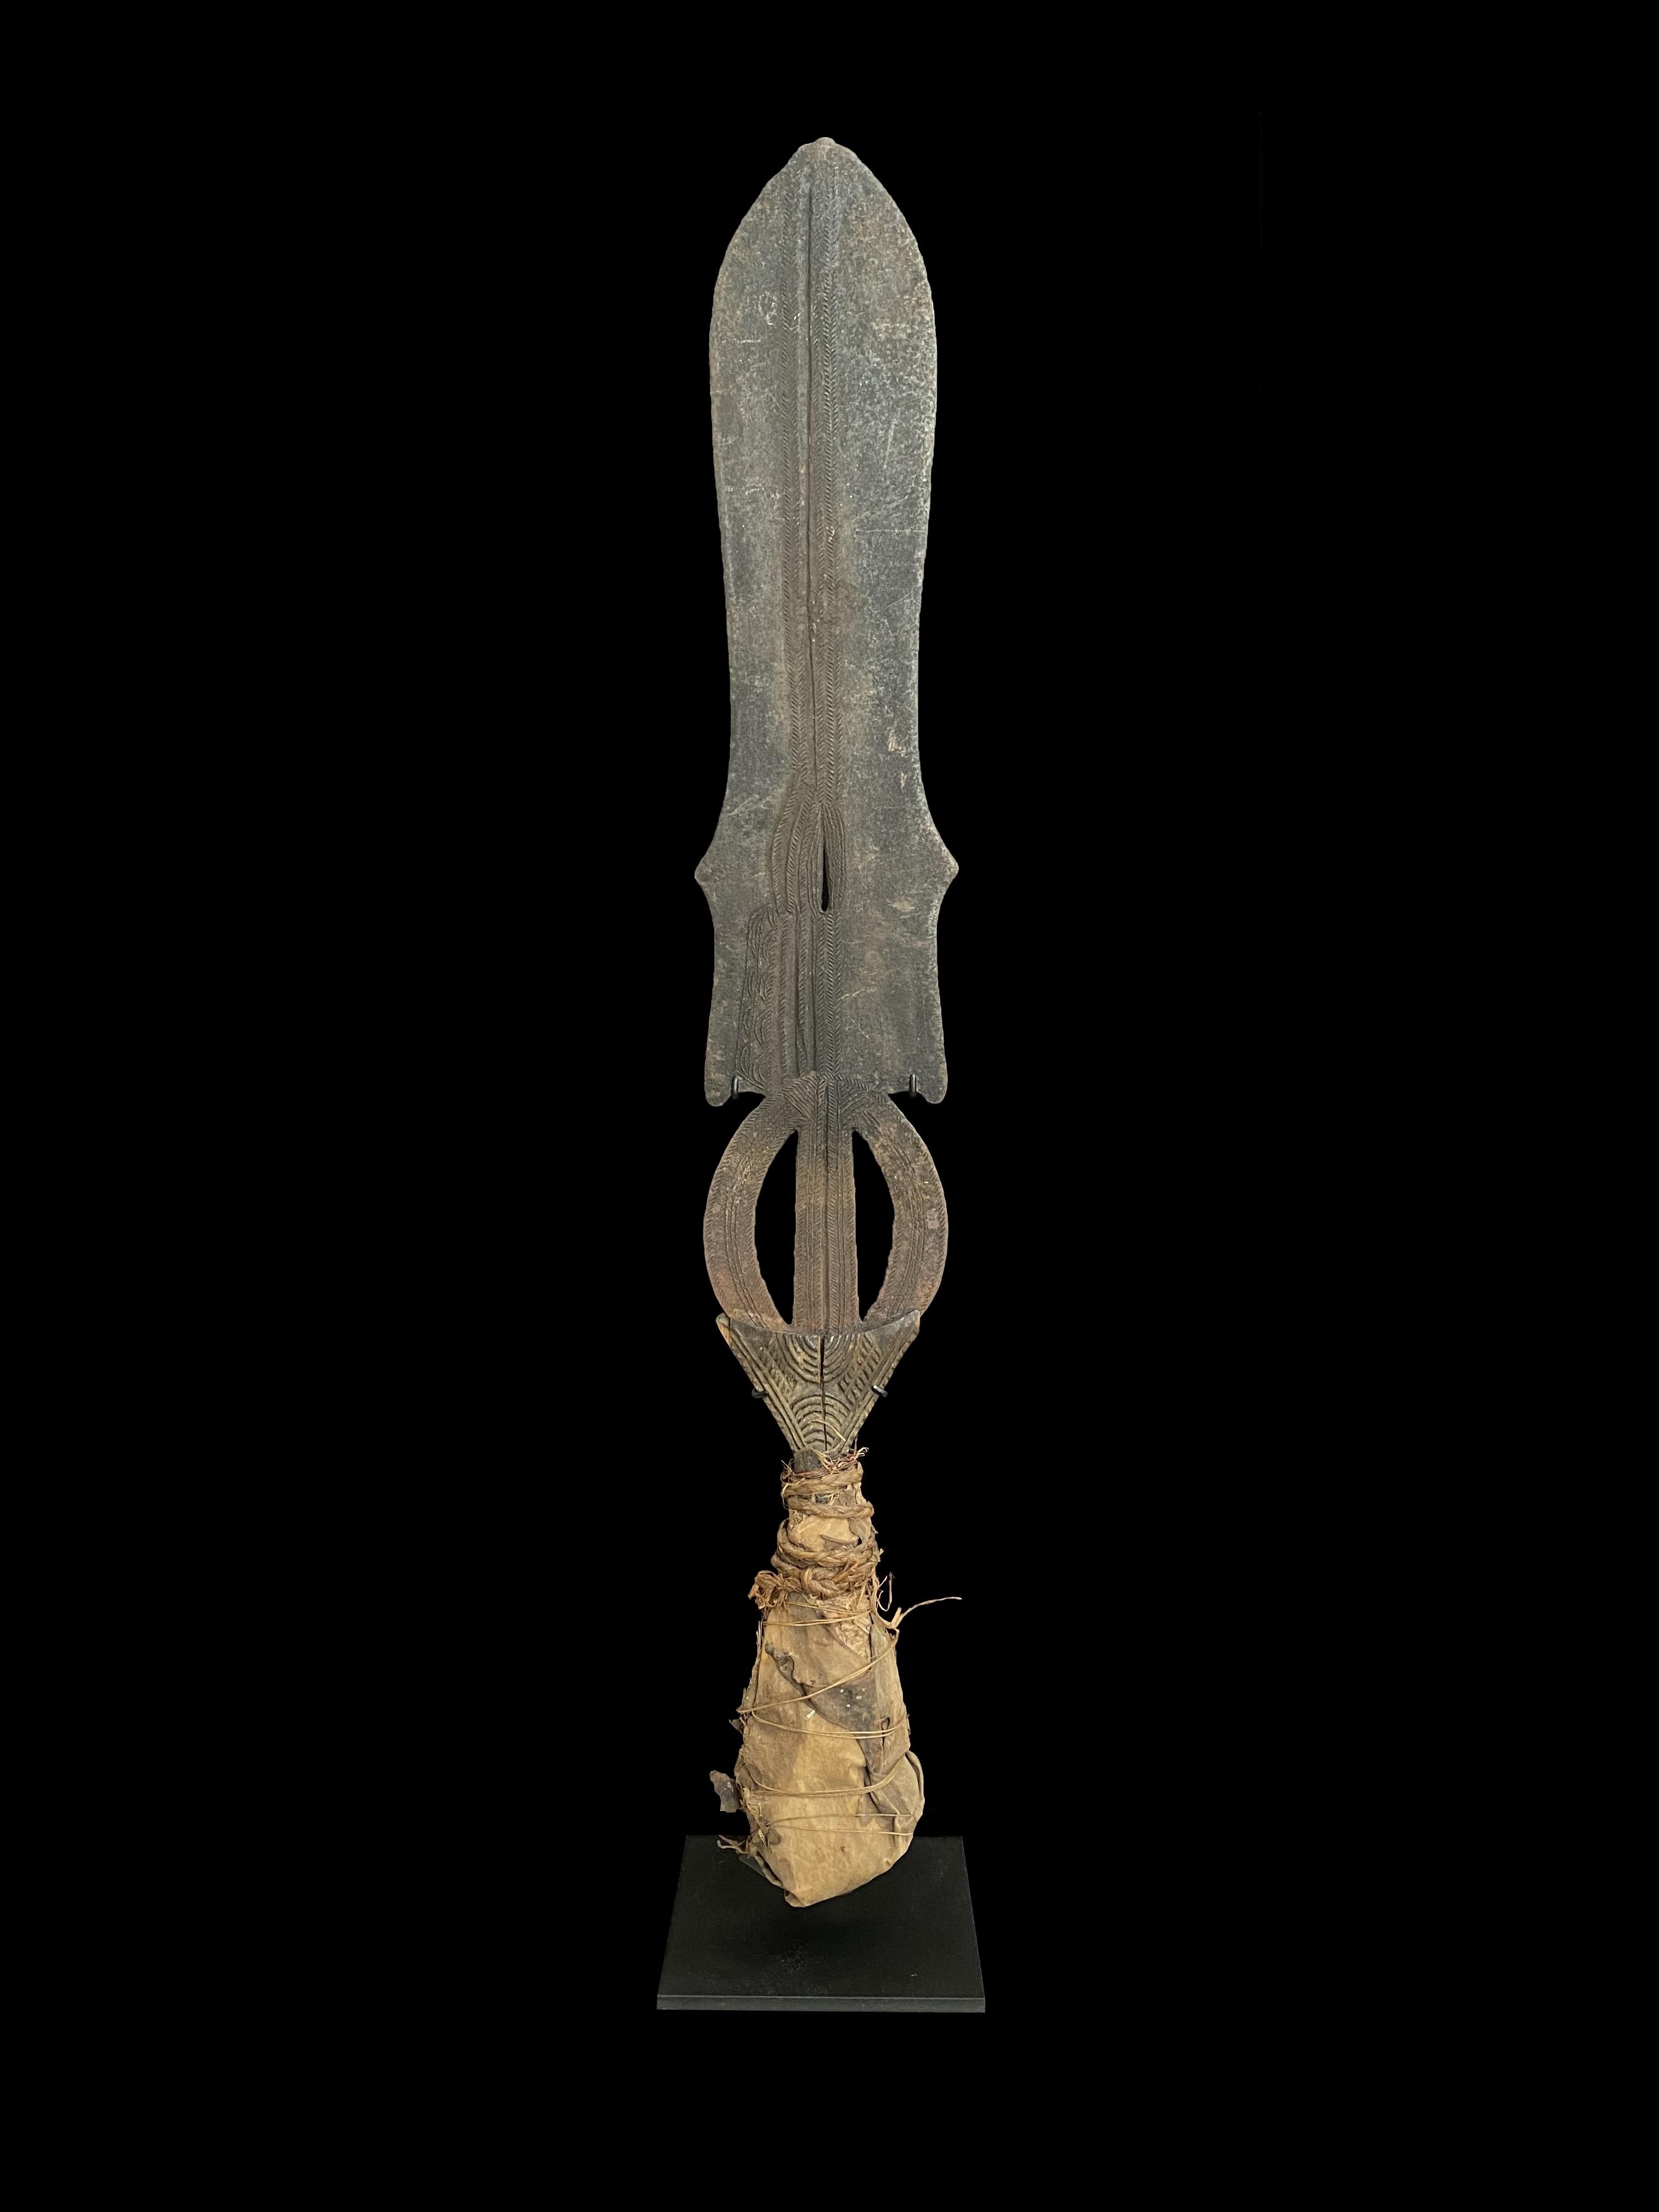 Ceremonial Sword - Ngombe, Doko, Poto and Mongo Peoples, D.R. Congo